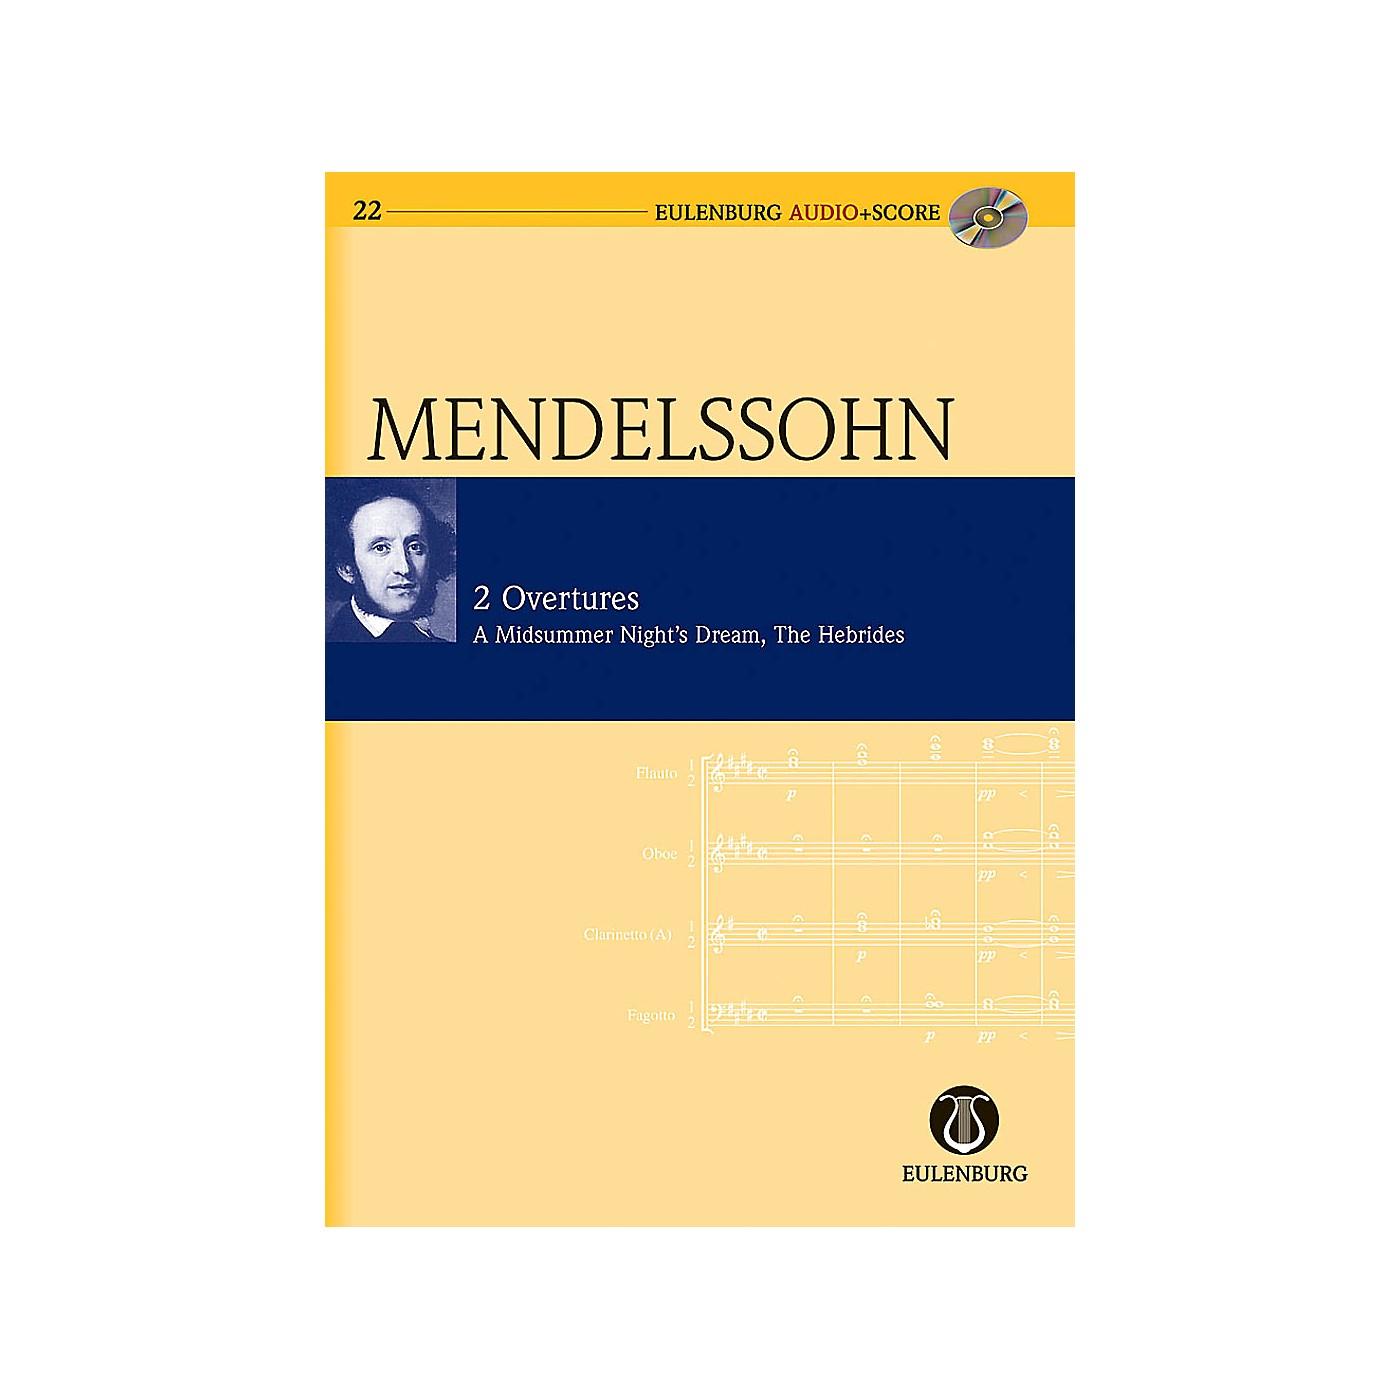 Eulenburg 2 Overtures: Op. 21/Op. 36 A Midsummer Night's Dream Eulenberg Audio plus Score w/ CD by Mendelssohn thumbnail